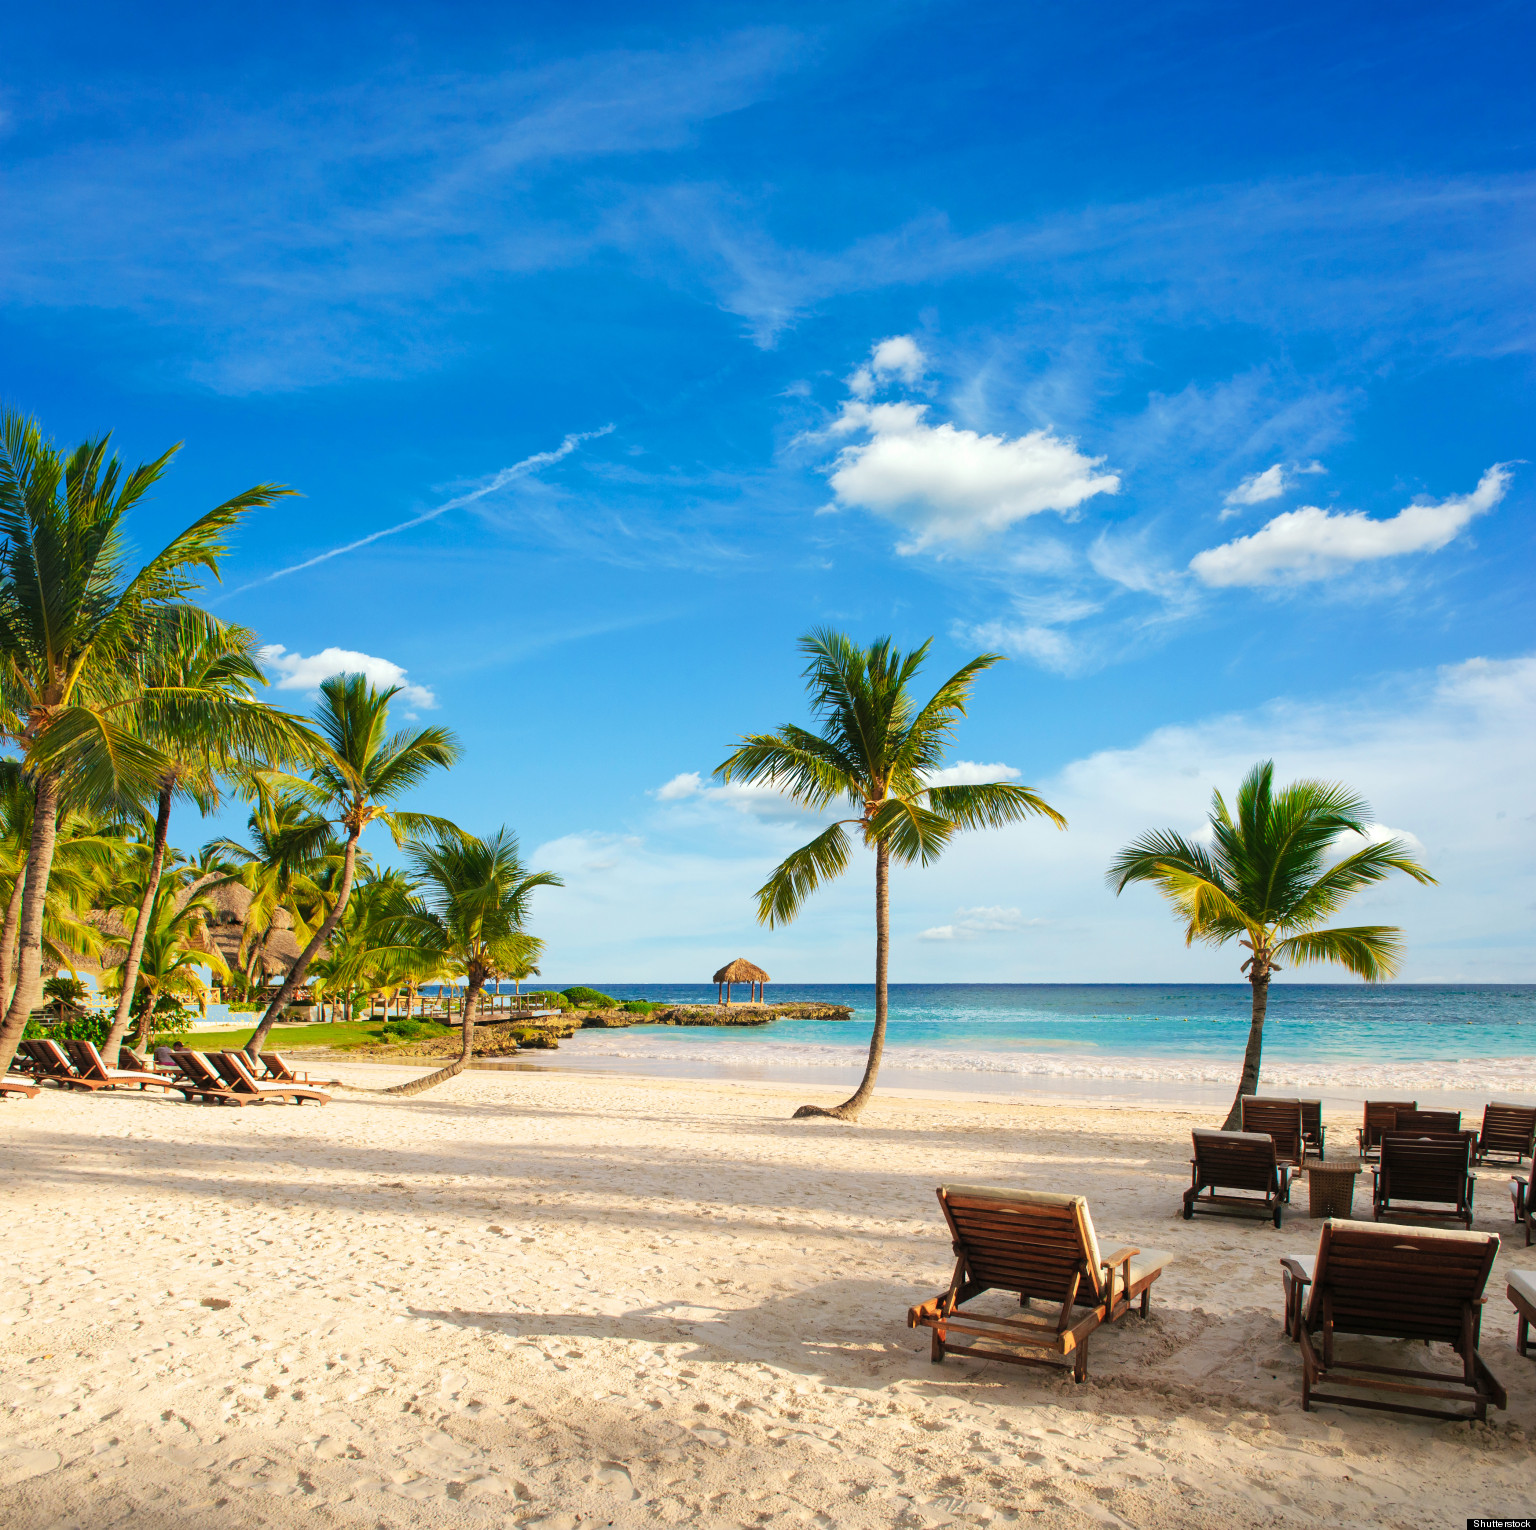 Caribbean Beach: IRS To Seek Info On U.S. Accounts At Caribbean Bank